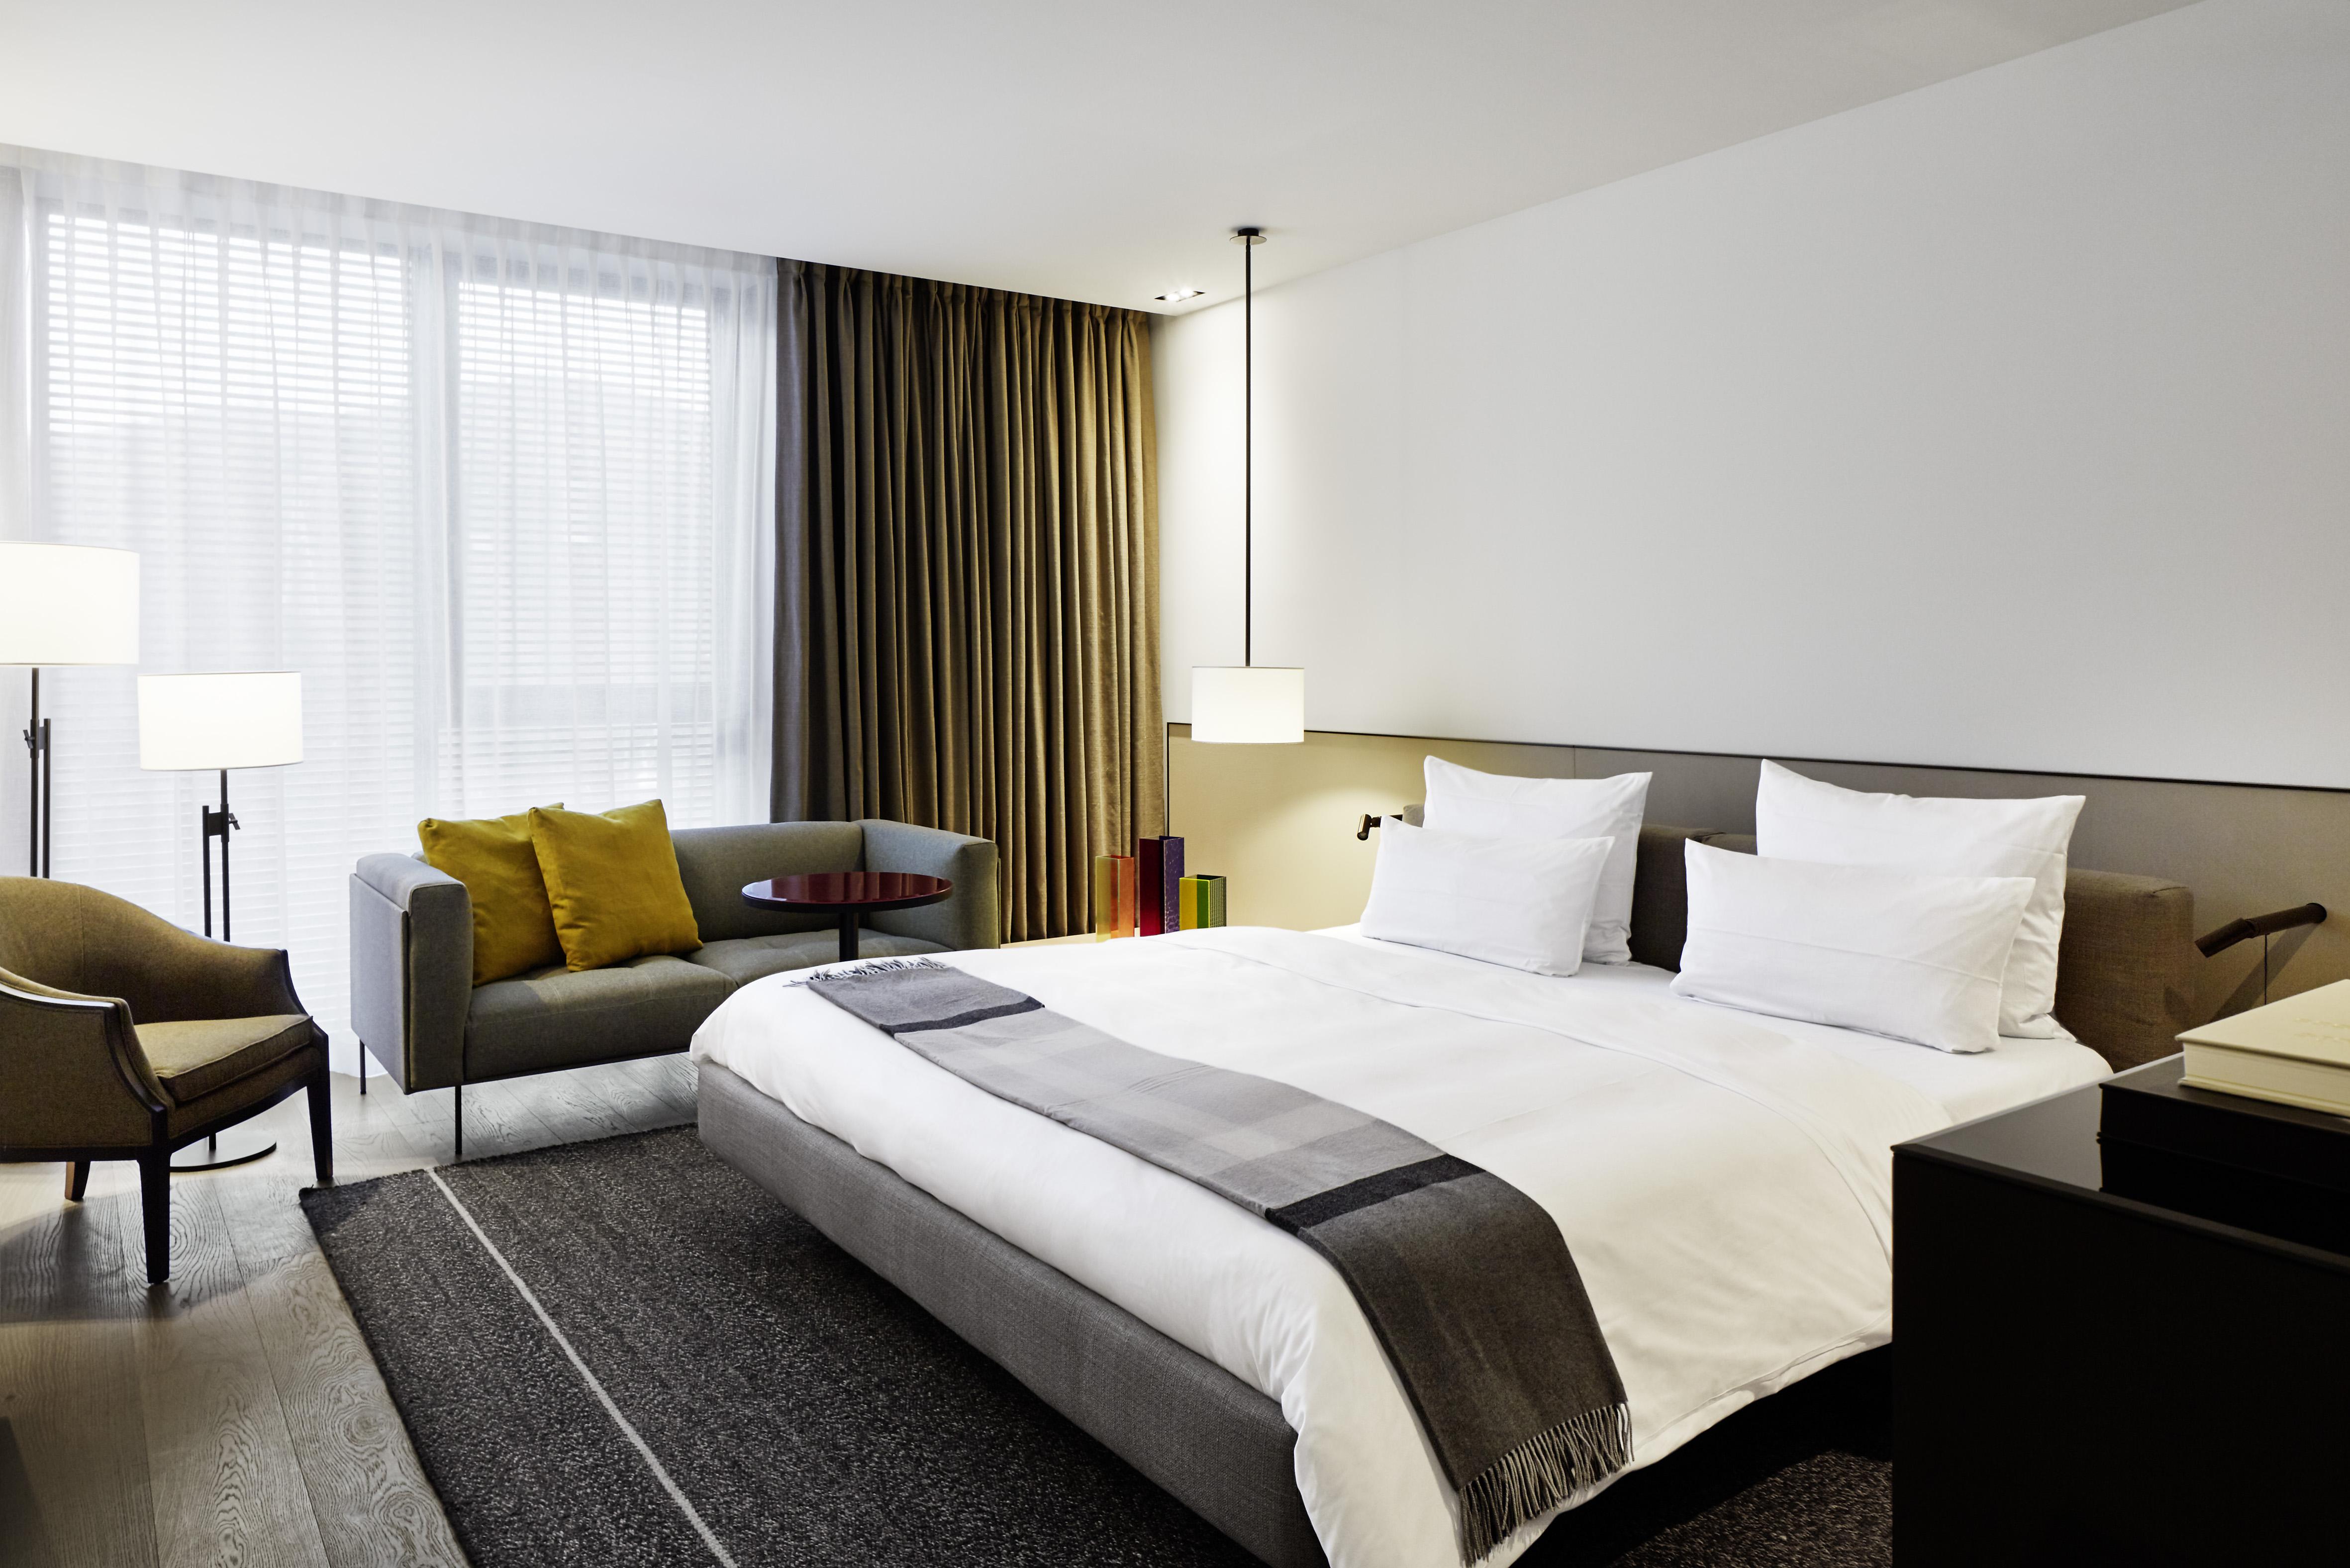 roomers baden baden gekko group. Black Bedroom Furniture Sets. Home Design Ideas